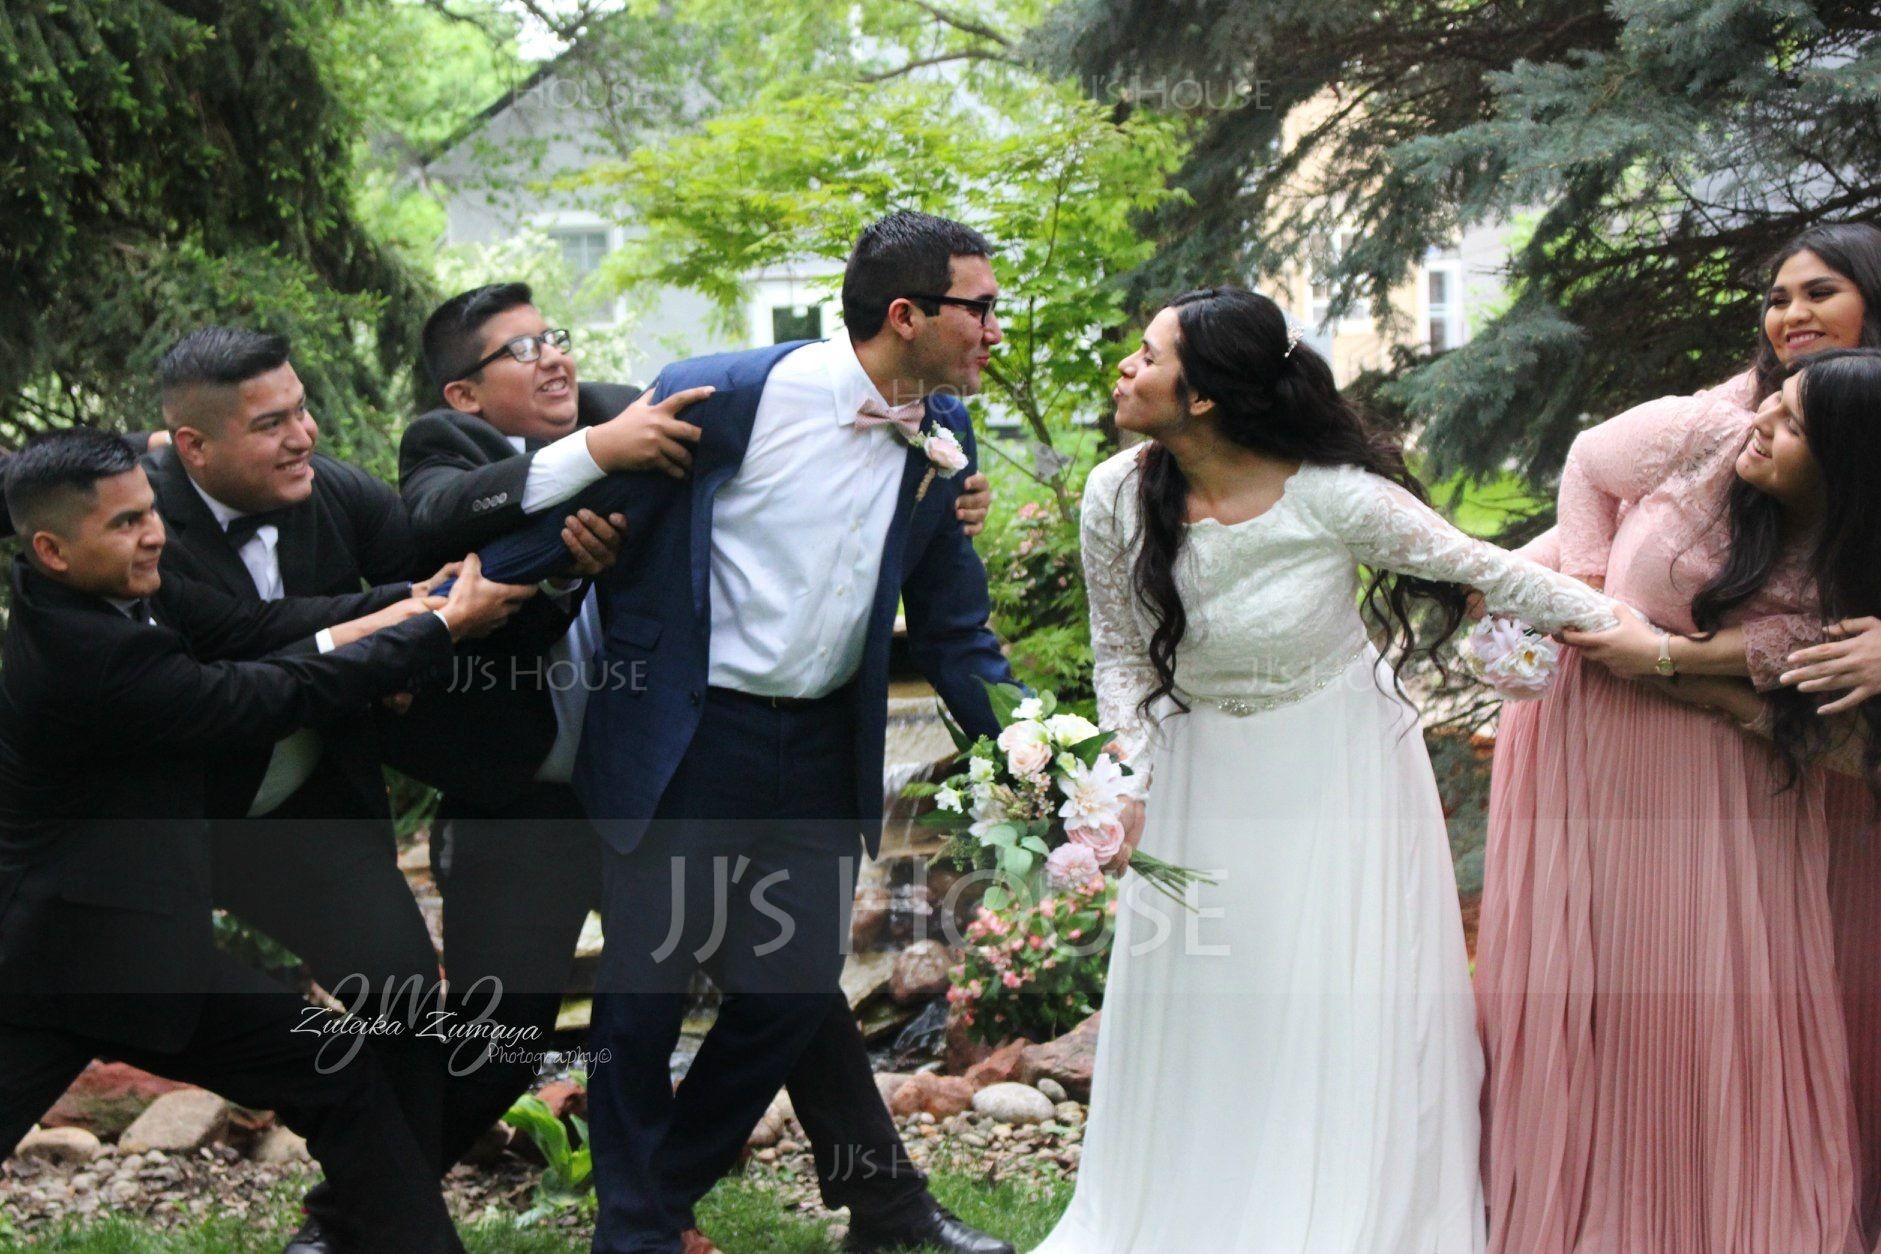 99 Dollar Wedding Gowns: A-Line/Princess Scoop Neck Court Train Chiffon Wedding